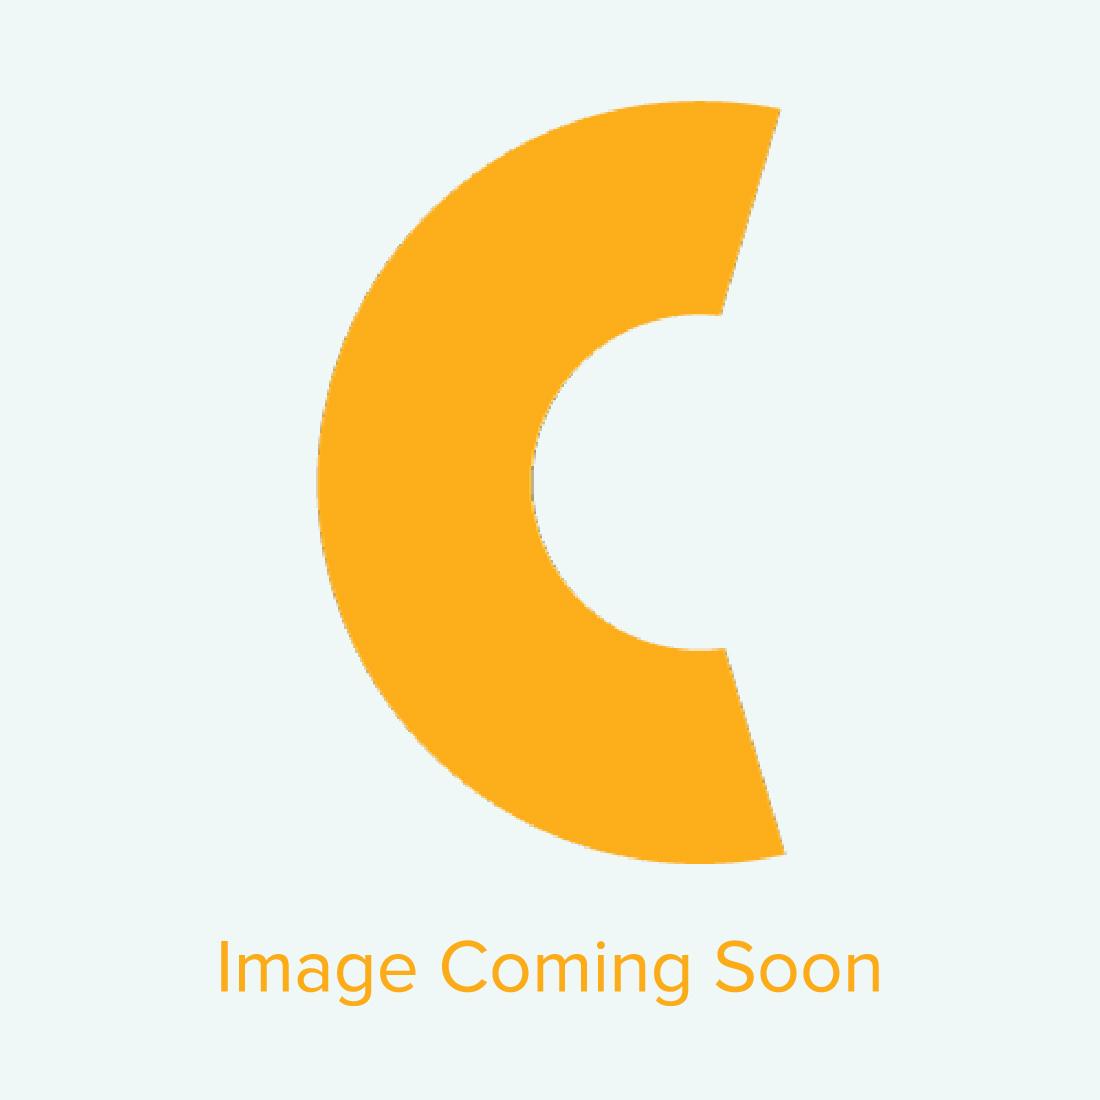 "Epson SureColor F6370 44"" Wide Format Dye Sublimation Production Edition Printer"